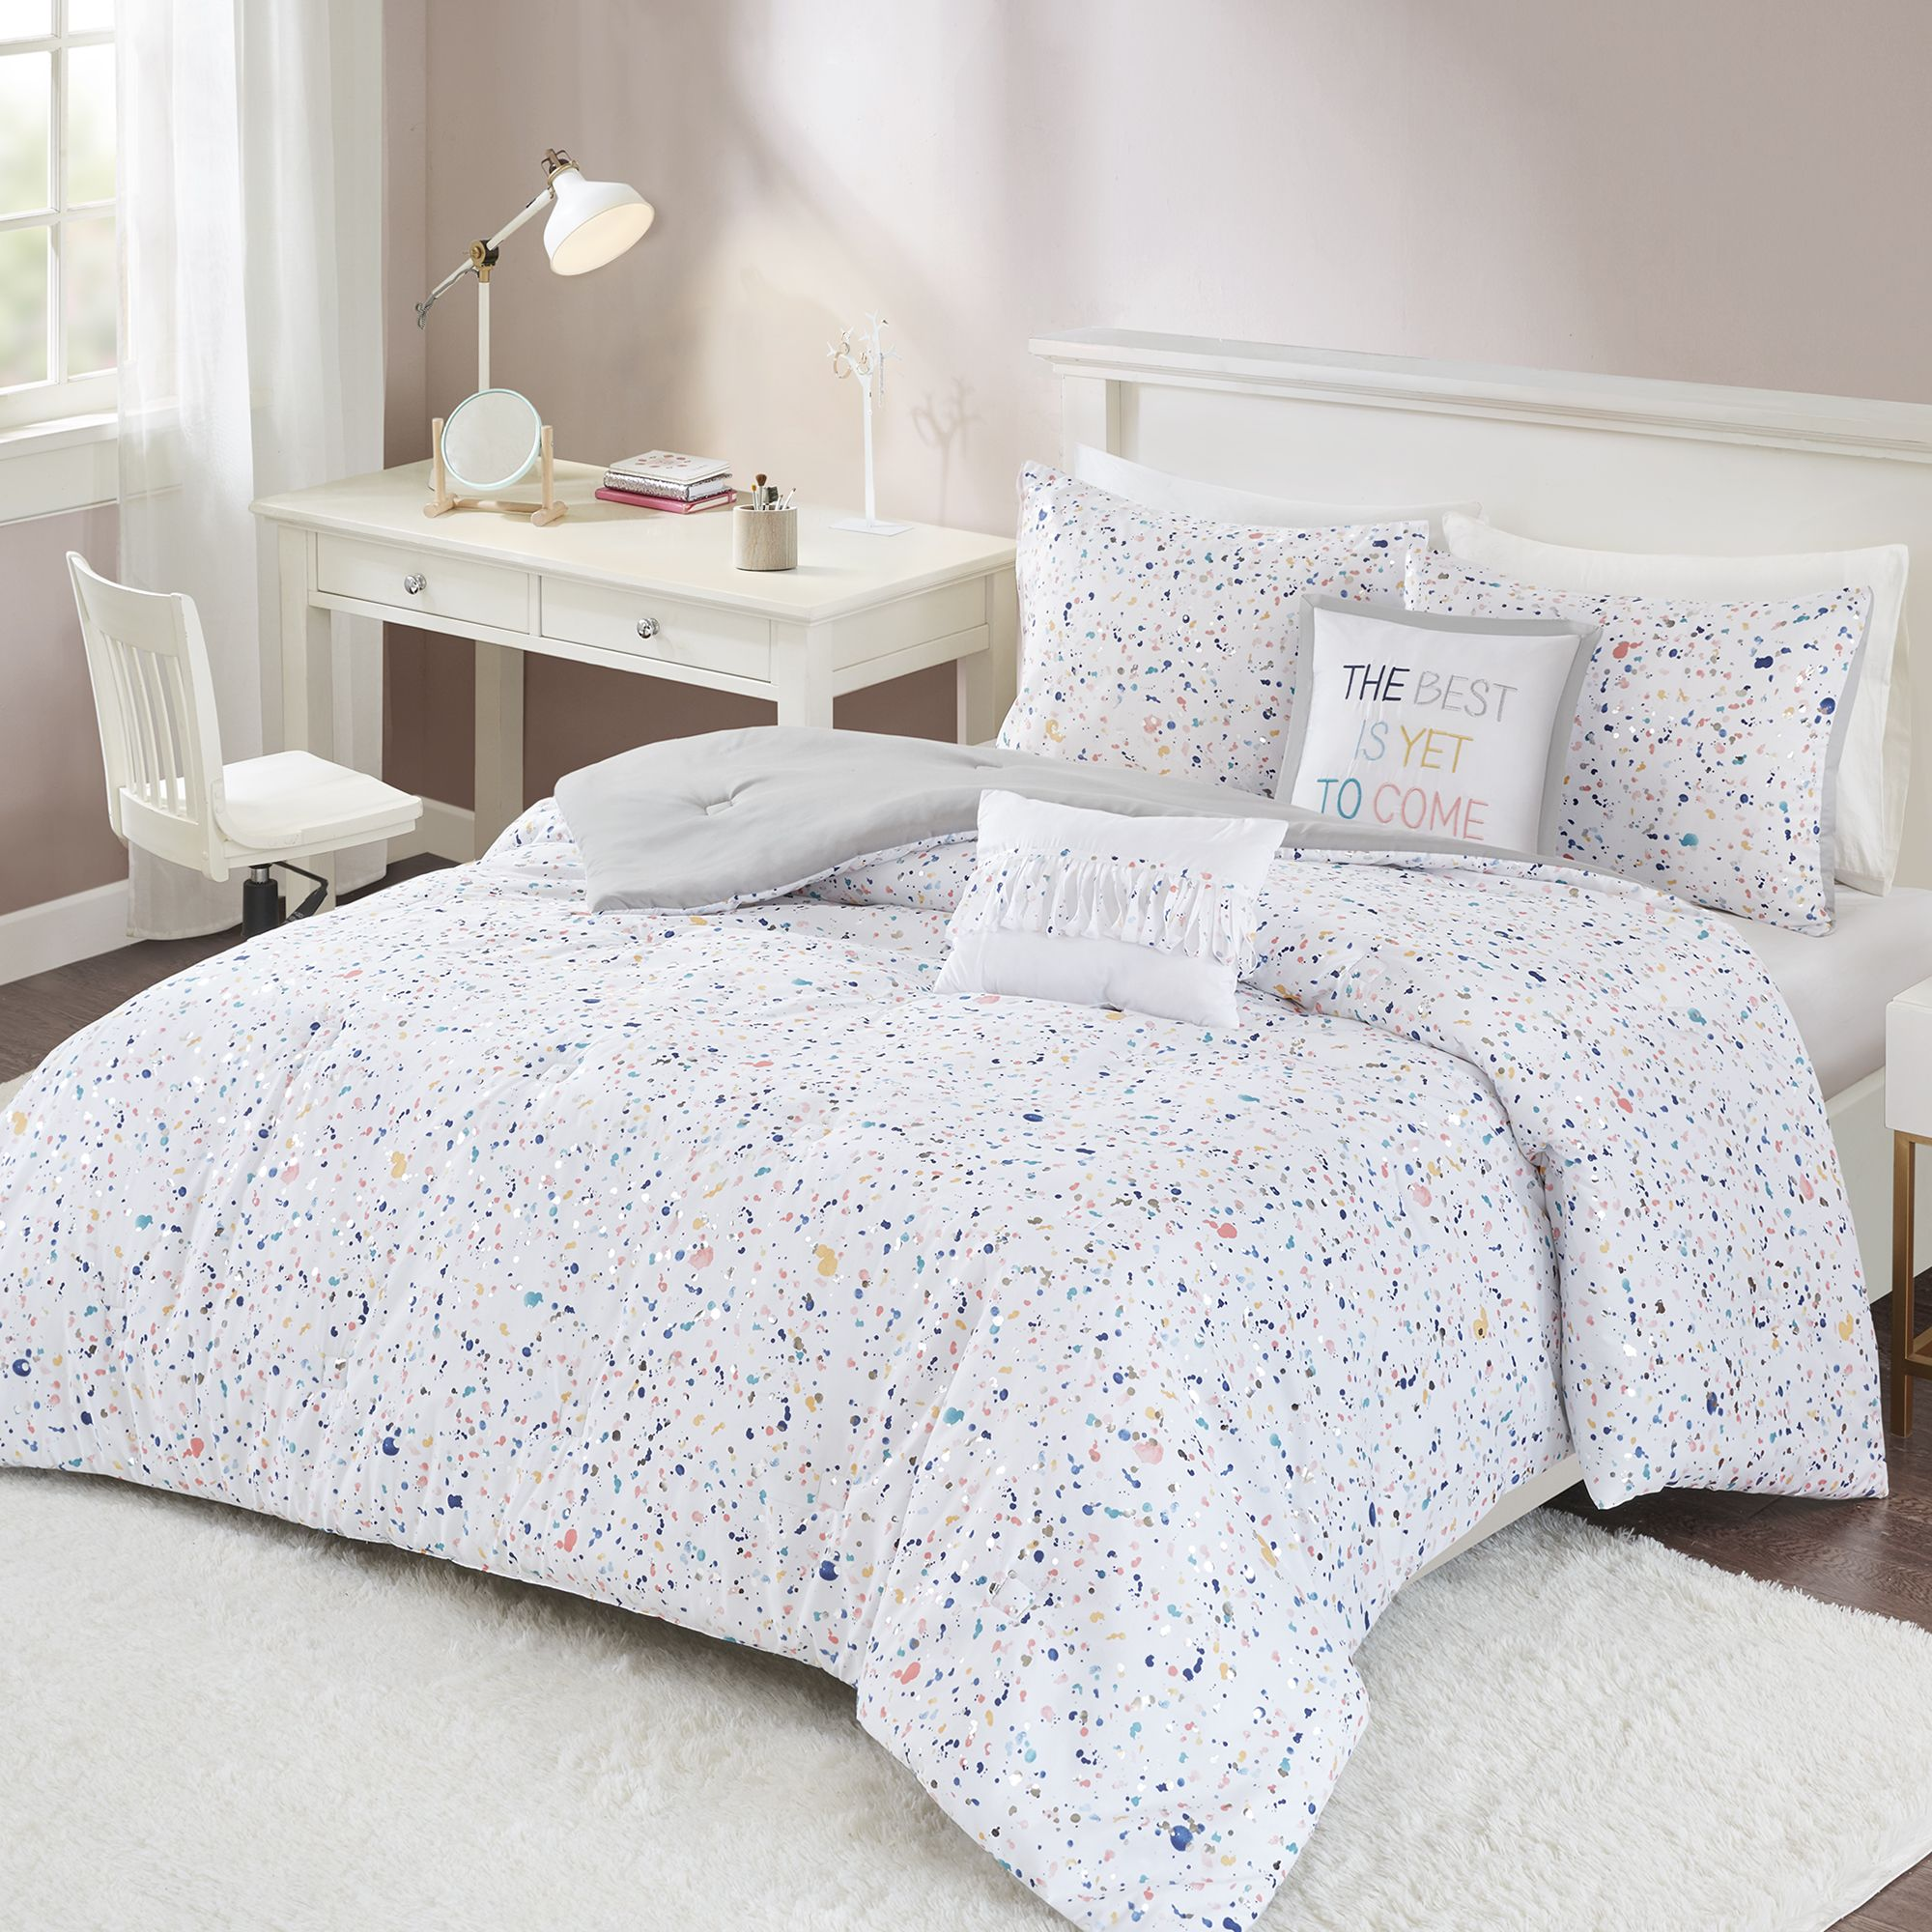 Shop by Brand Bed comforters, Comforter bedding sets